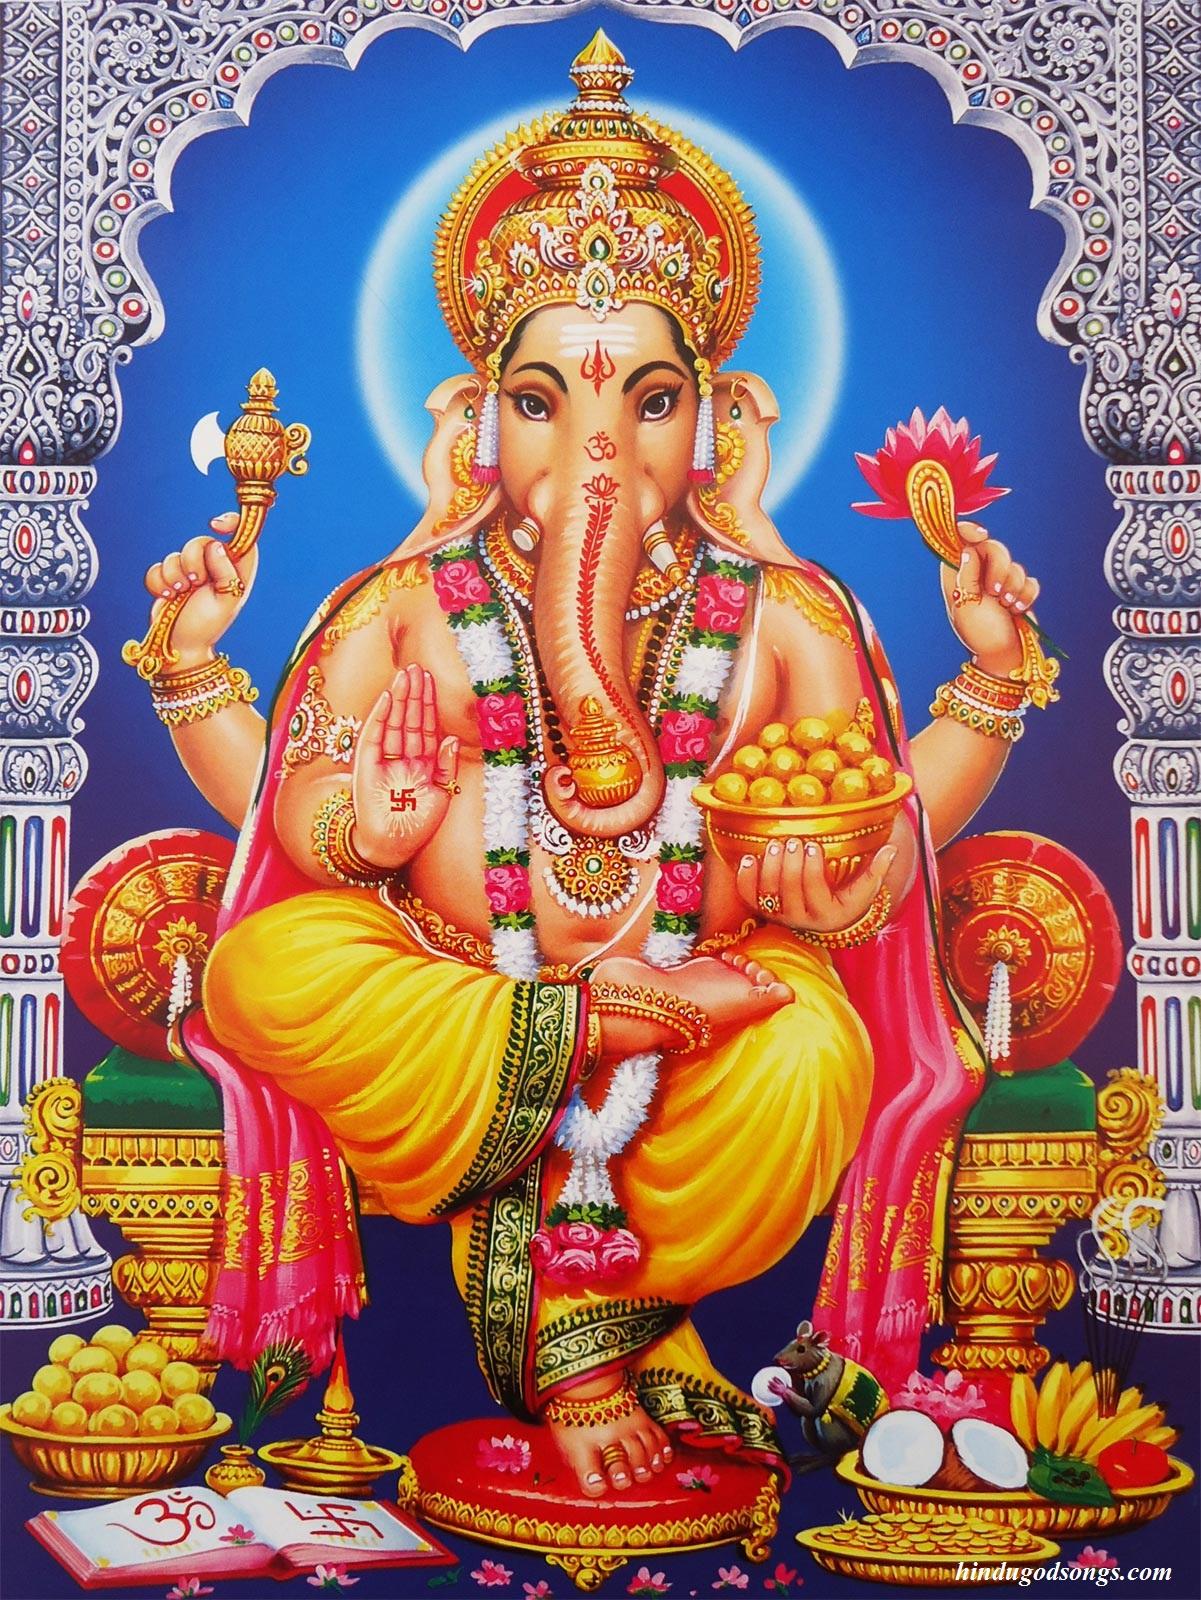 Vinayagar Songs Vol 1 Songs Download Vinayagar Songs Vol 1 Tamil Full Mp3 Songs Free Download